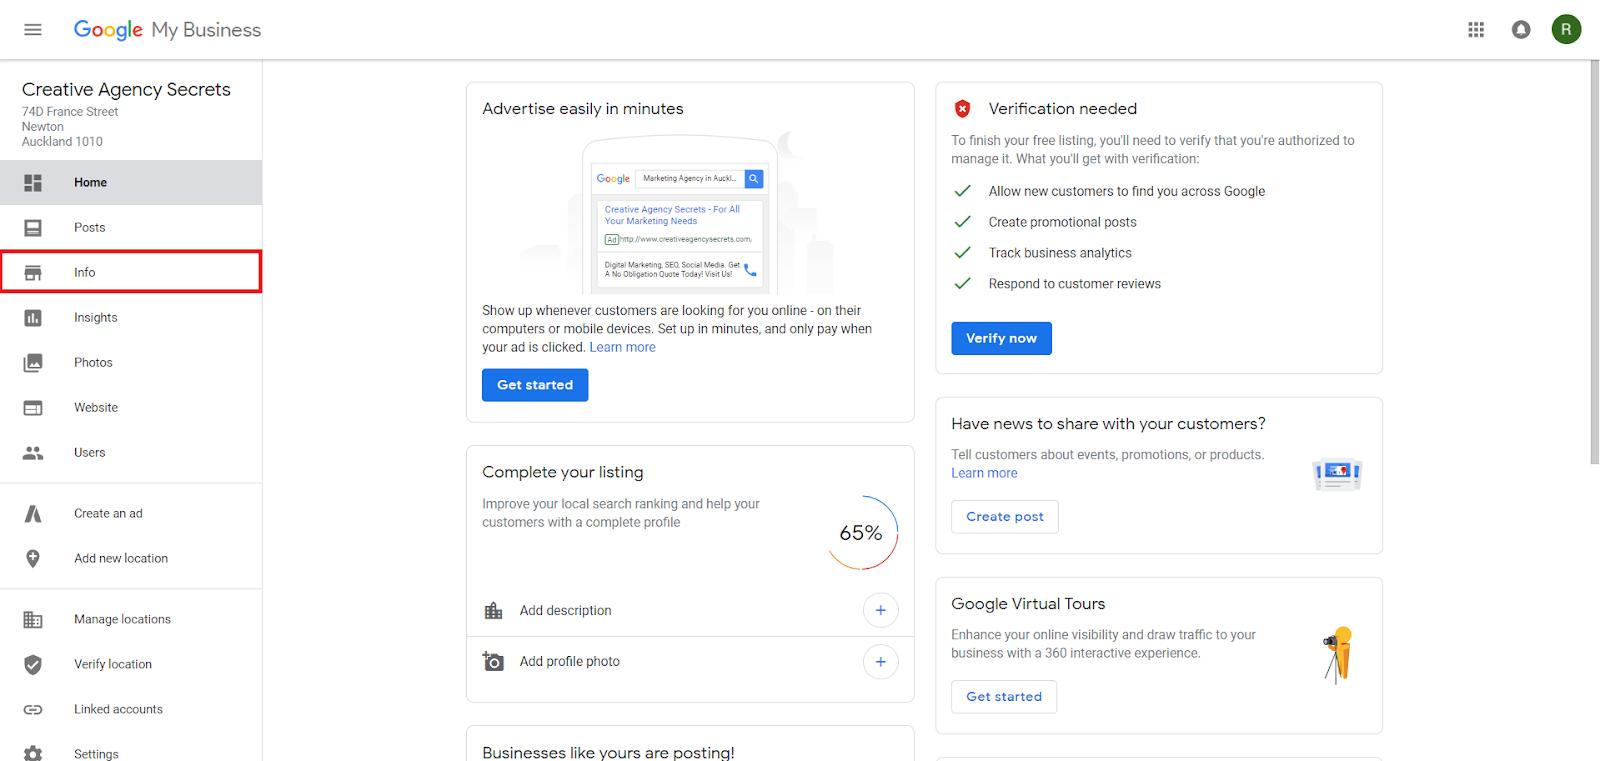 Google My Business Portal